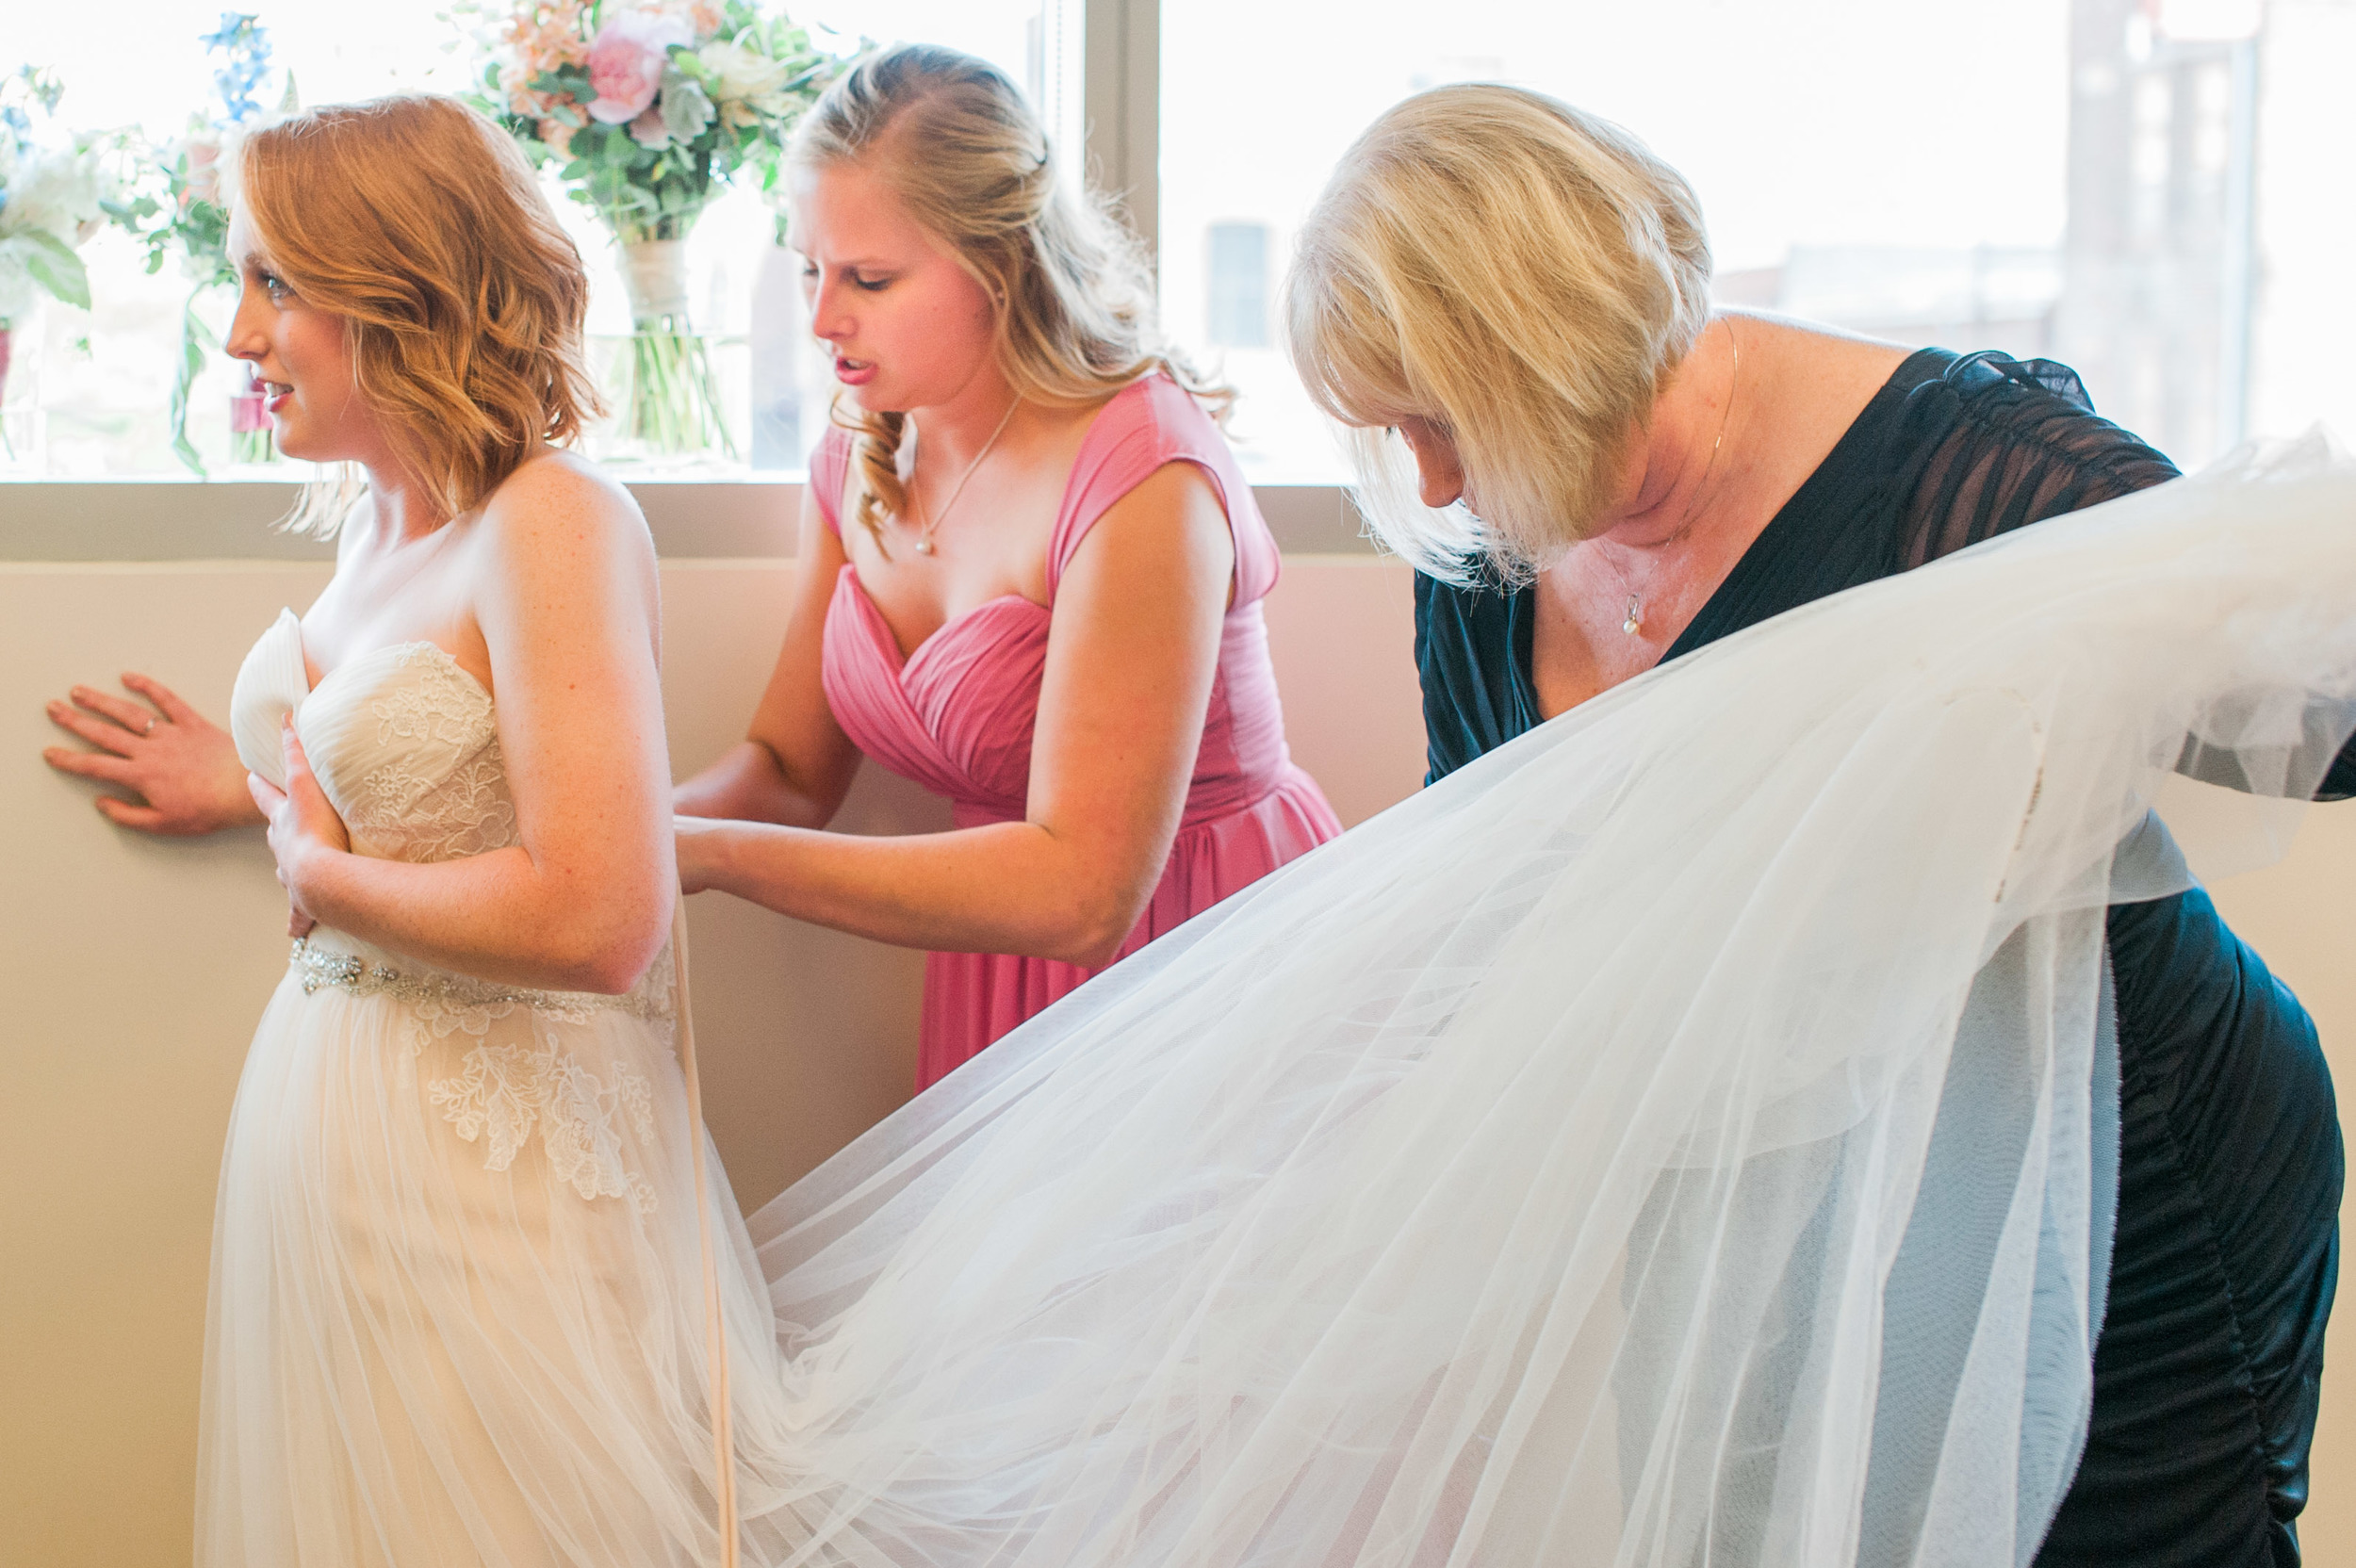 omaha-holland-arts-center-wedding-19.jpg